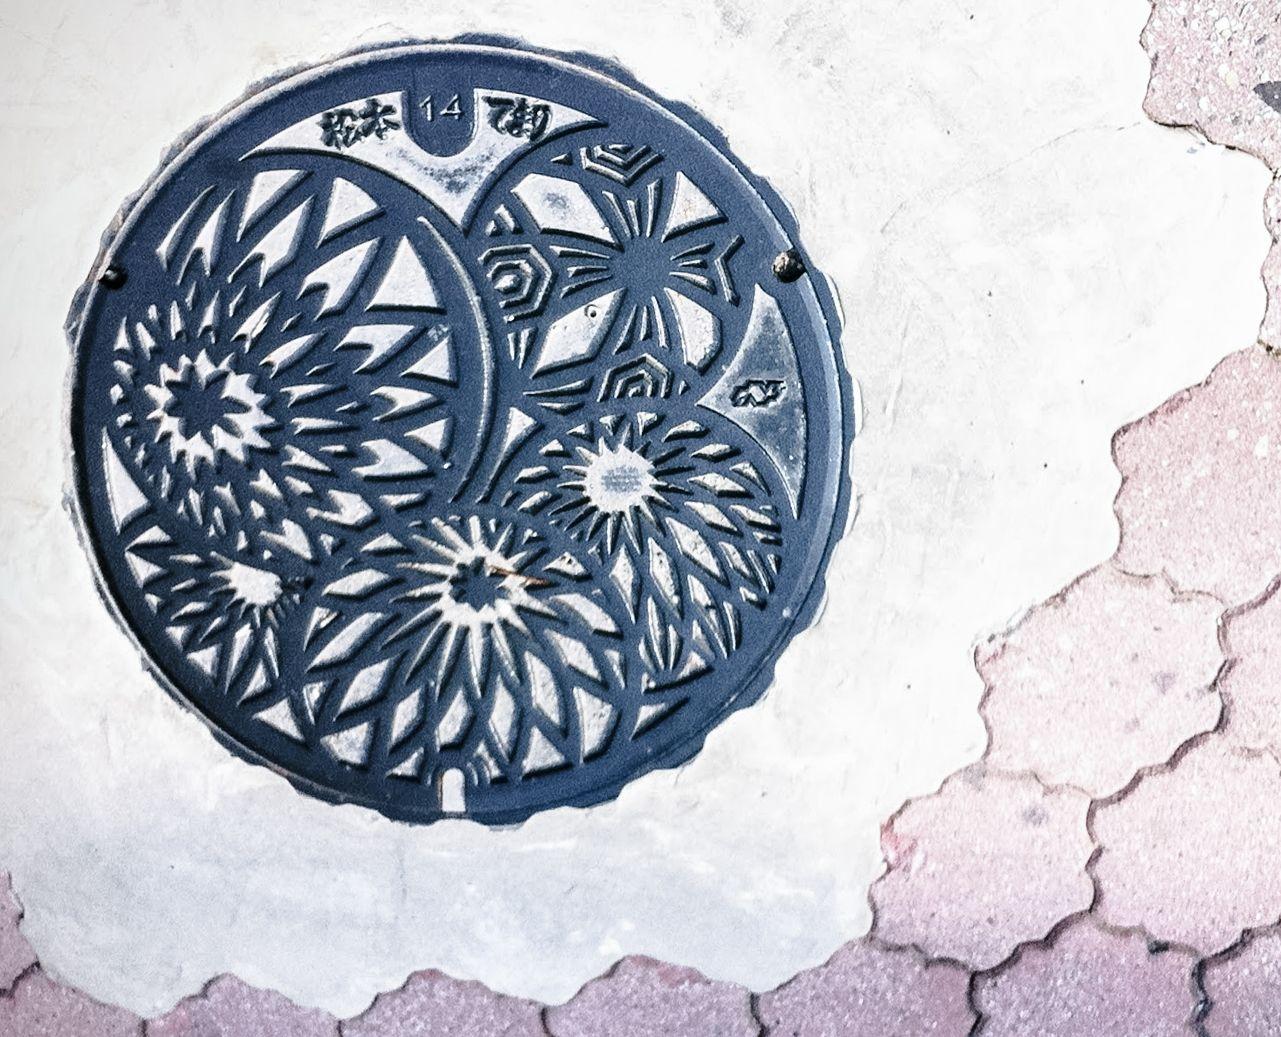 ☆ Temari Ball / 手鞠 : Manhole Cover ,Matsumoto, Nagano, Japan